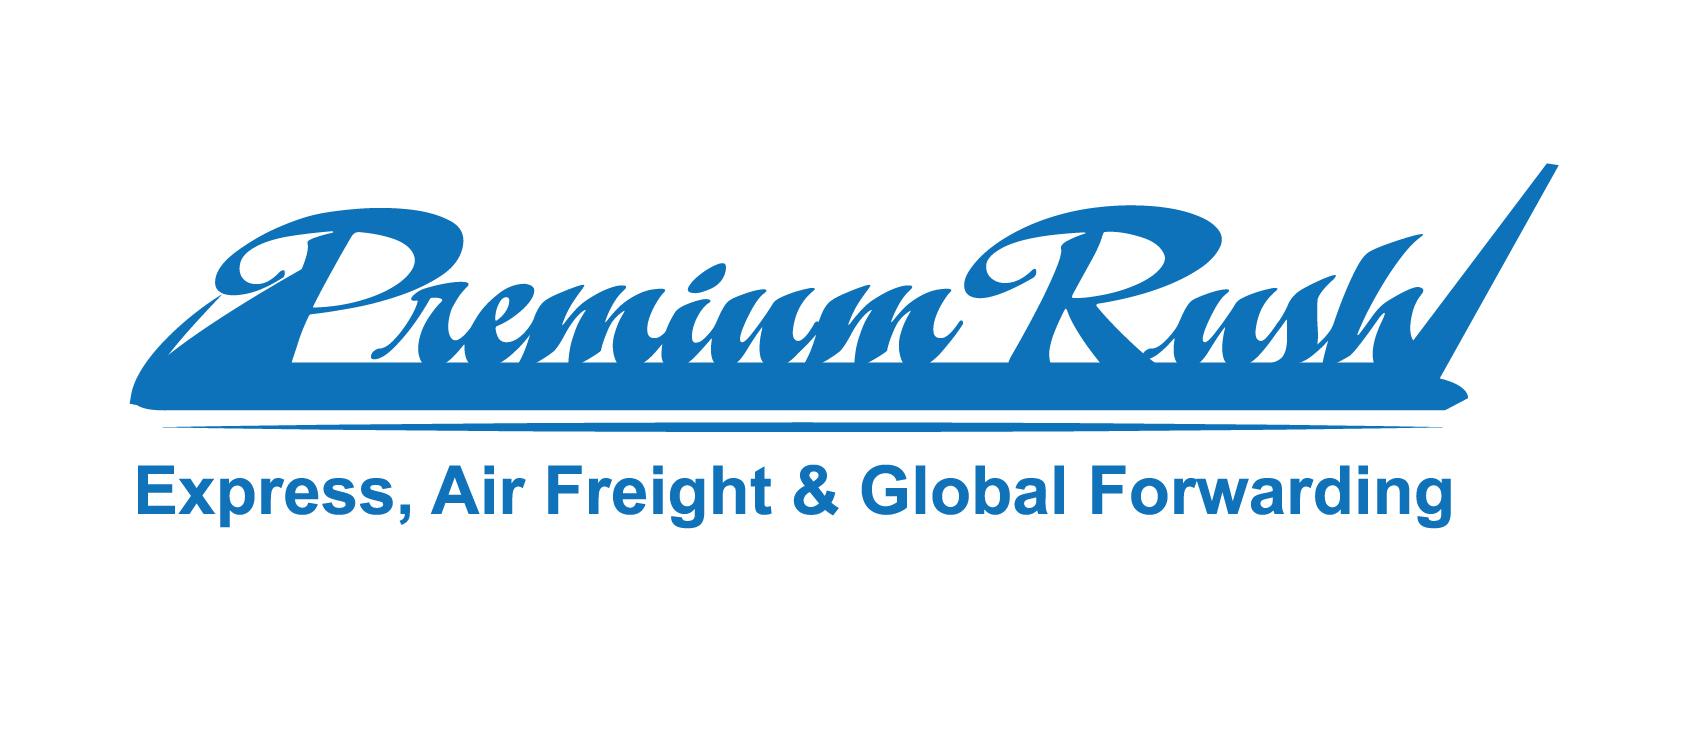 PREMIUM RUSH – Cung cấp dịch vụ Logistics